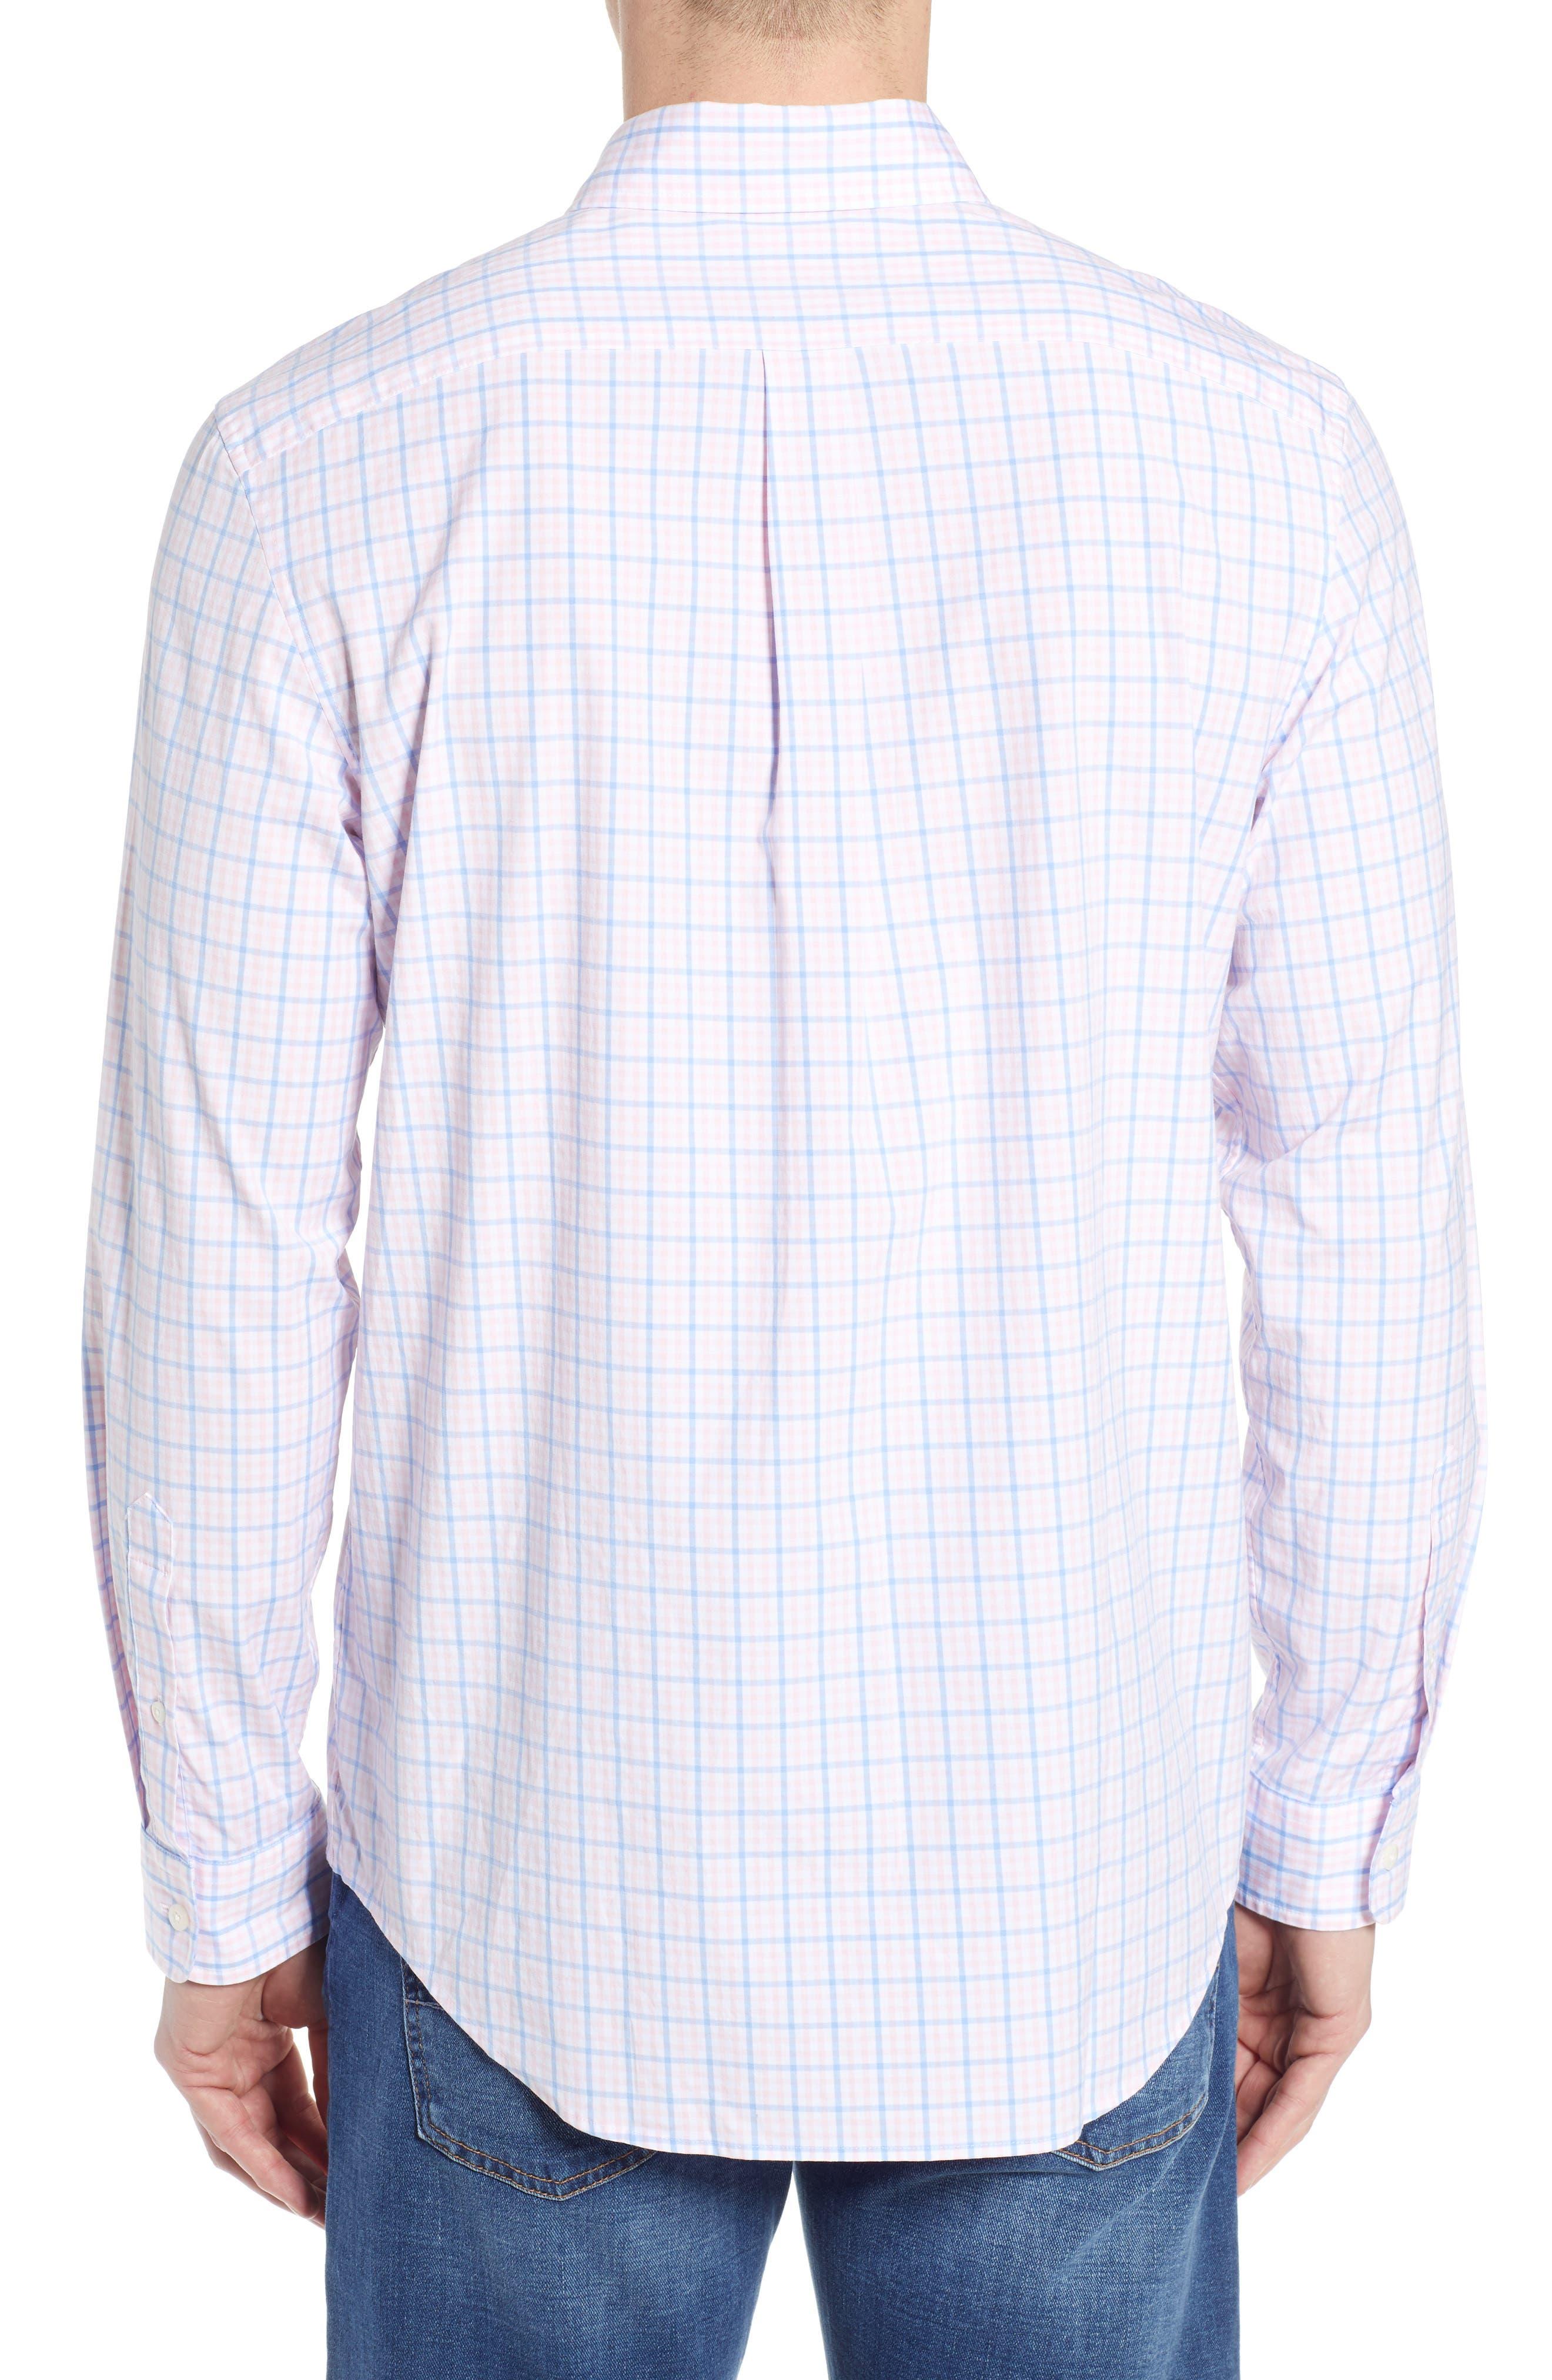 Murray Classic Fit Check Sport Shirt,                             Alternate thumbnail 3, color,                             FLAMINGO